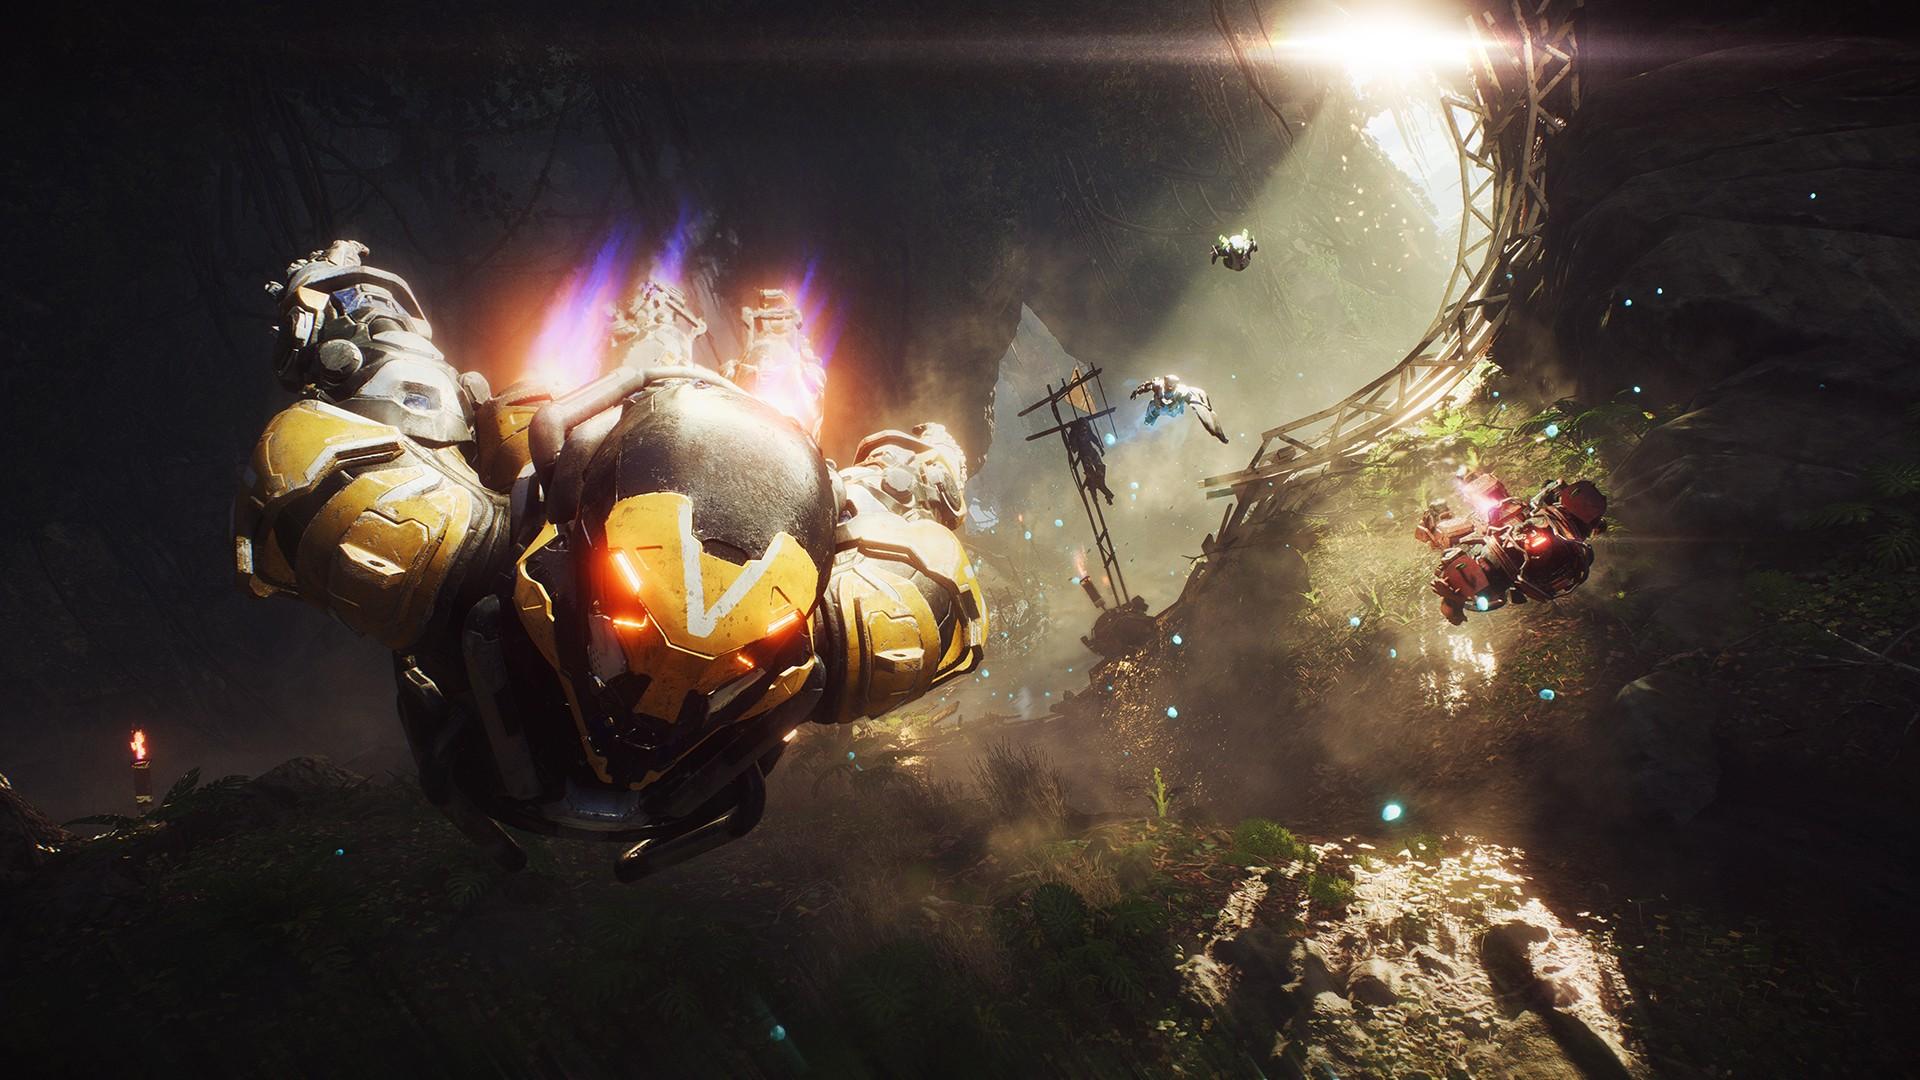 BioWare only has 30-ish people working on overhauling Anthem screenshot